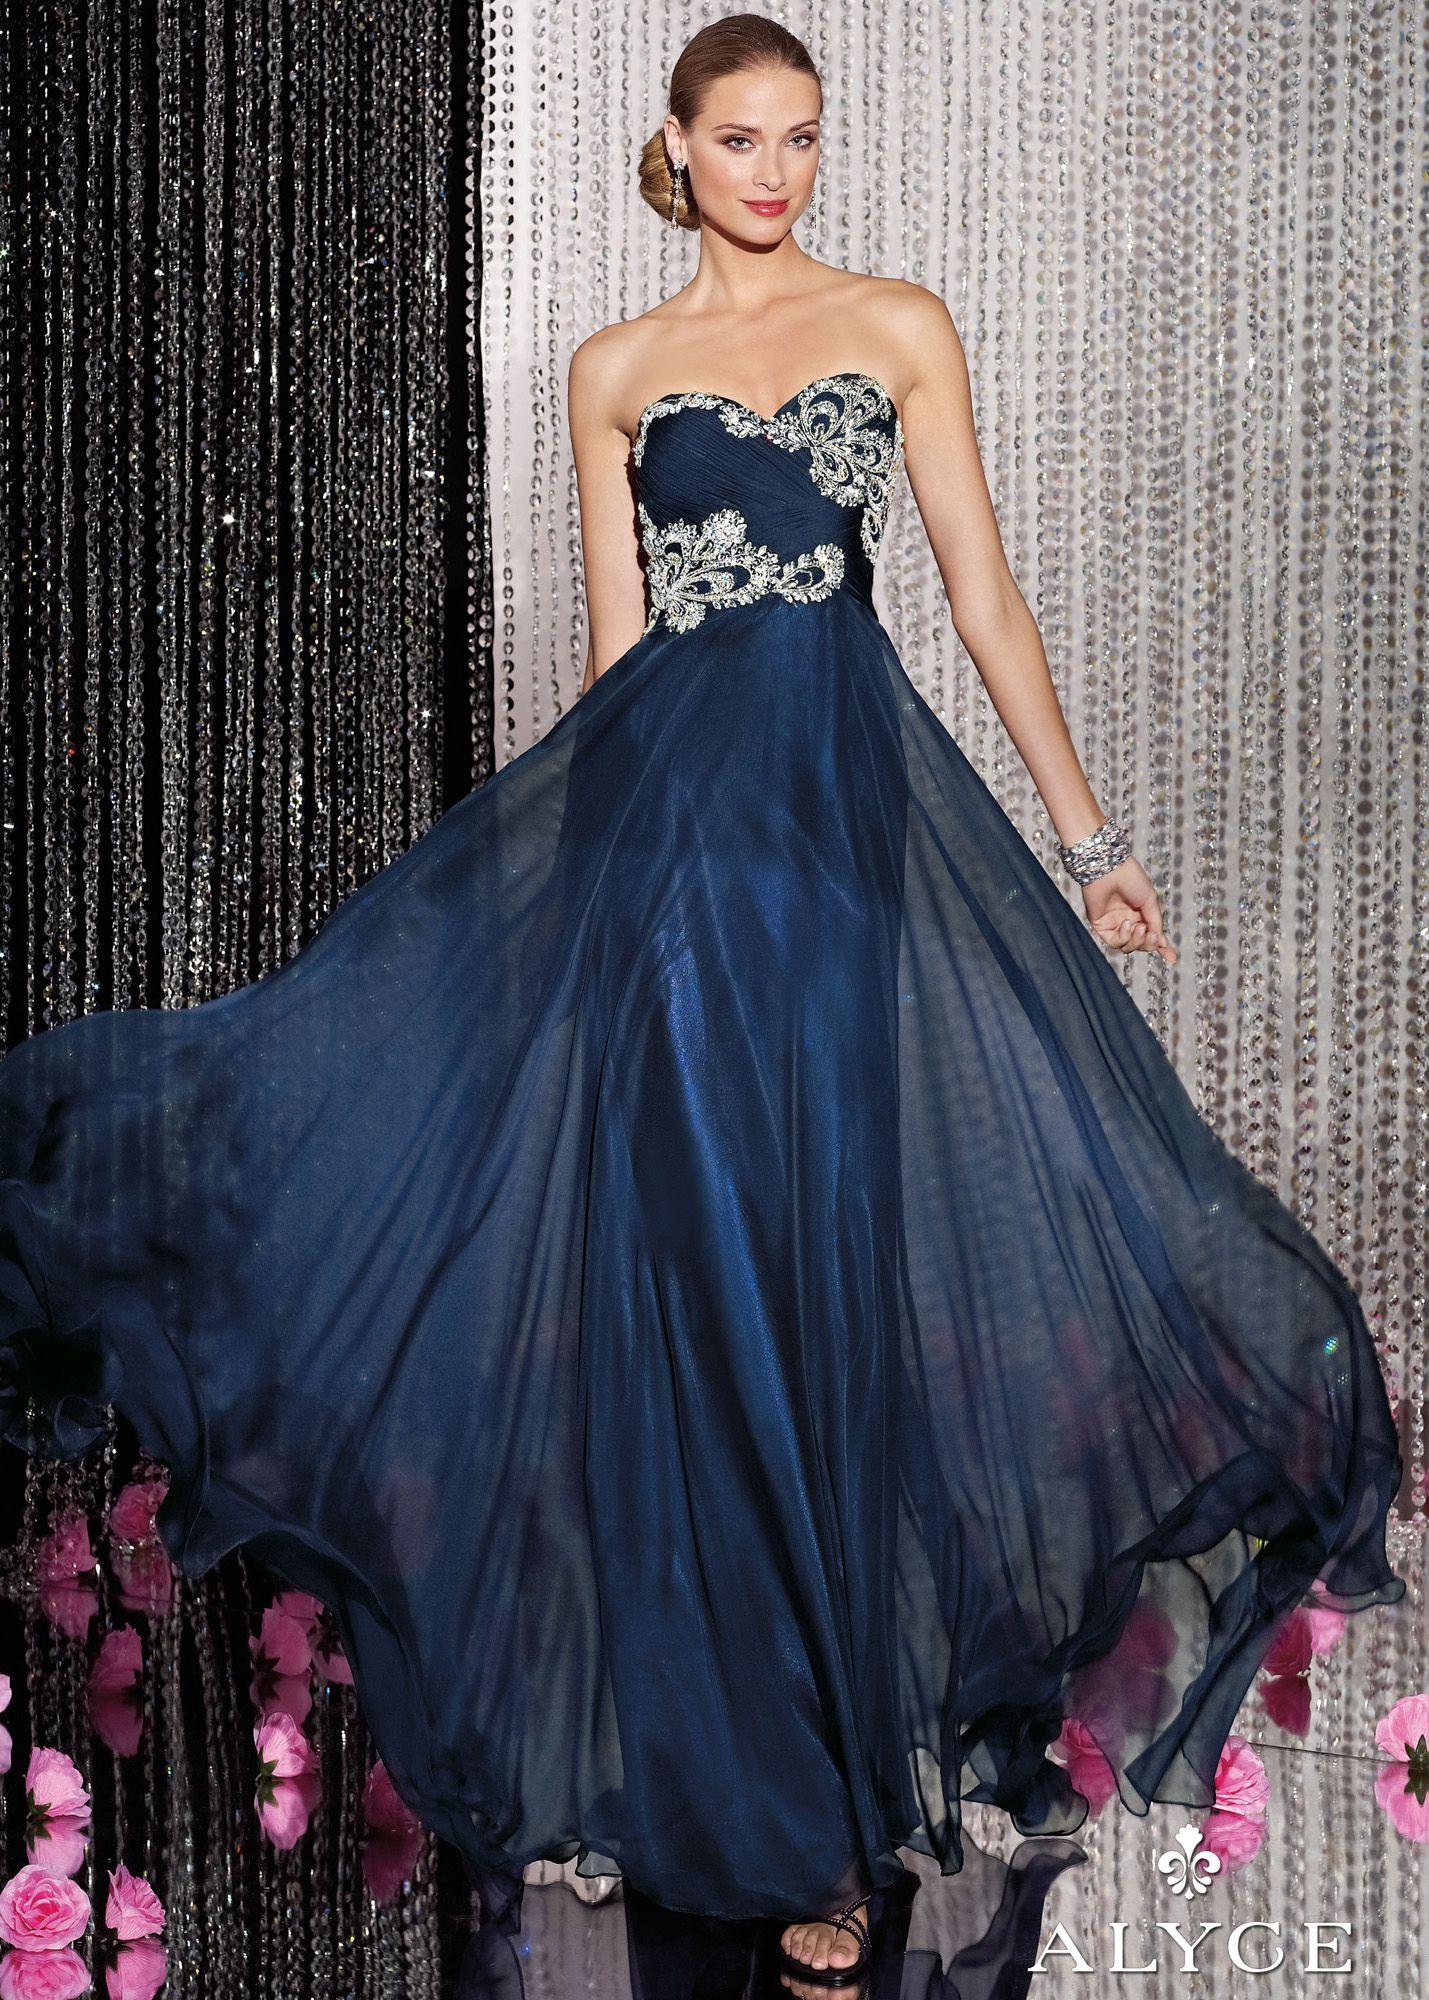 Alyce Paris 5594 - Midnight Blue Strapless Chiffon Prom Dresses ...